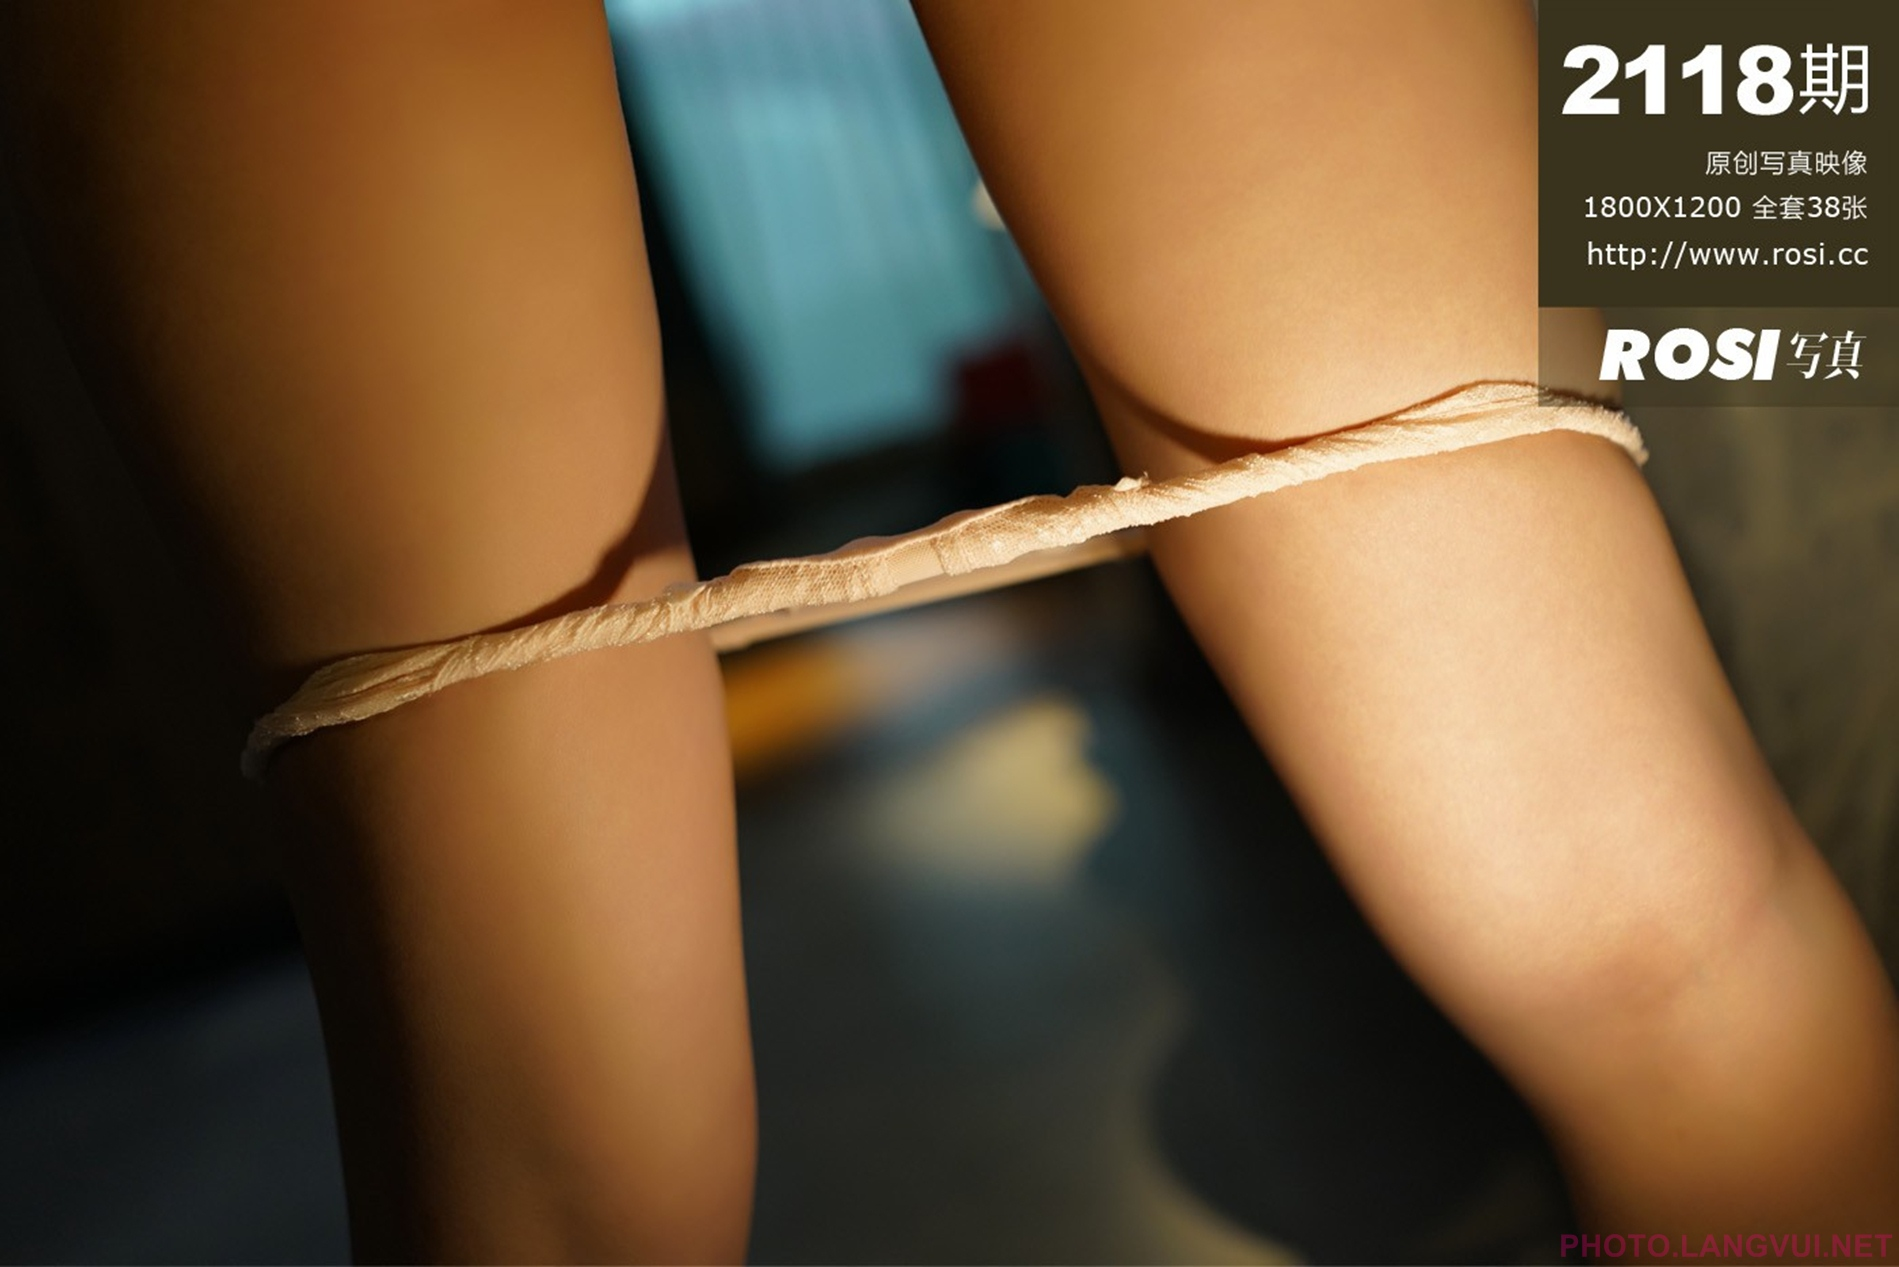 ROSI No 2118